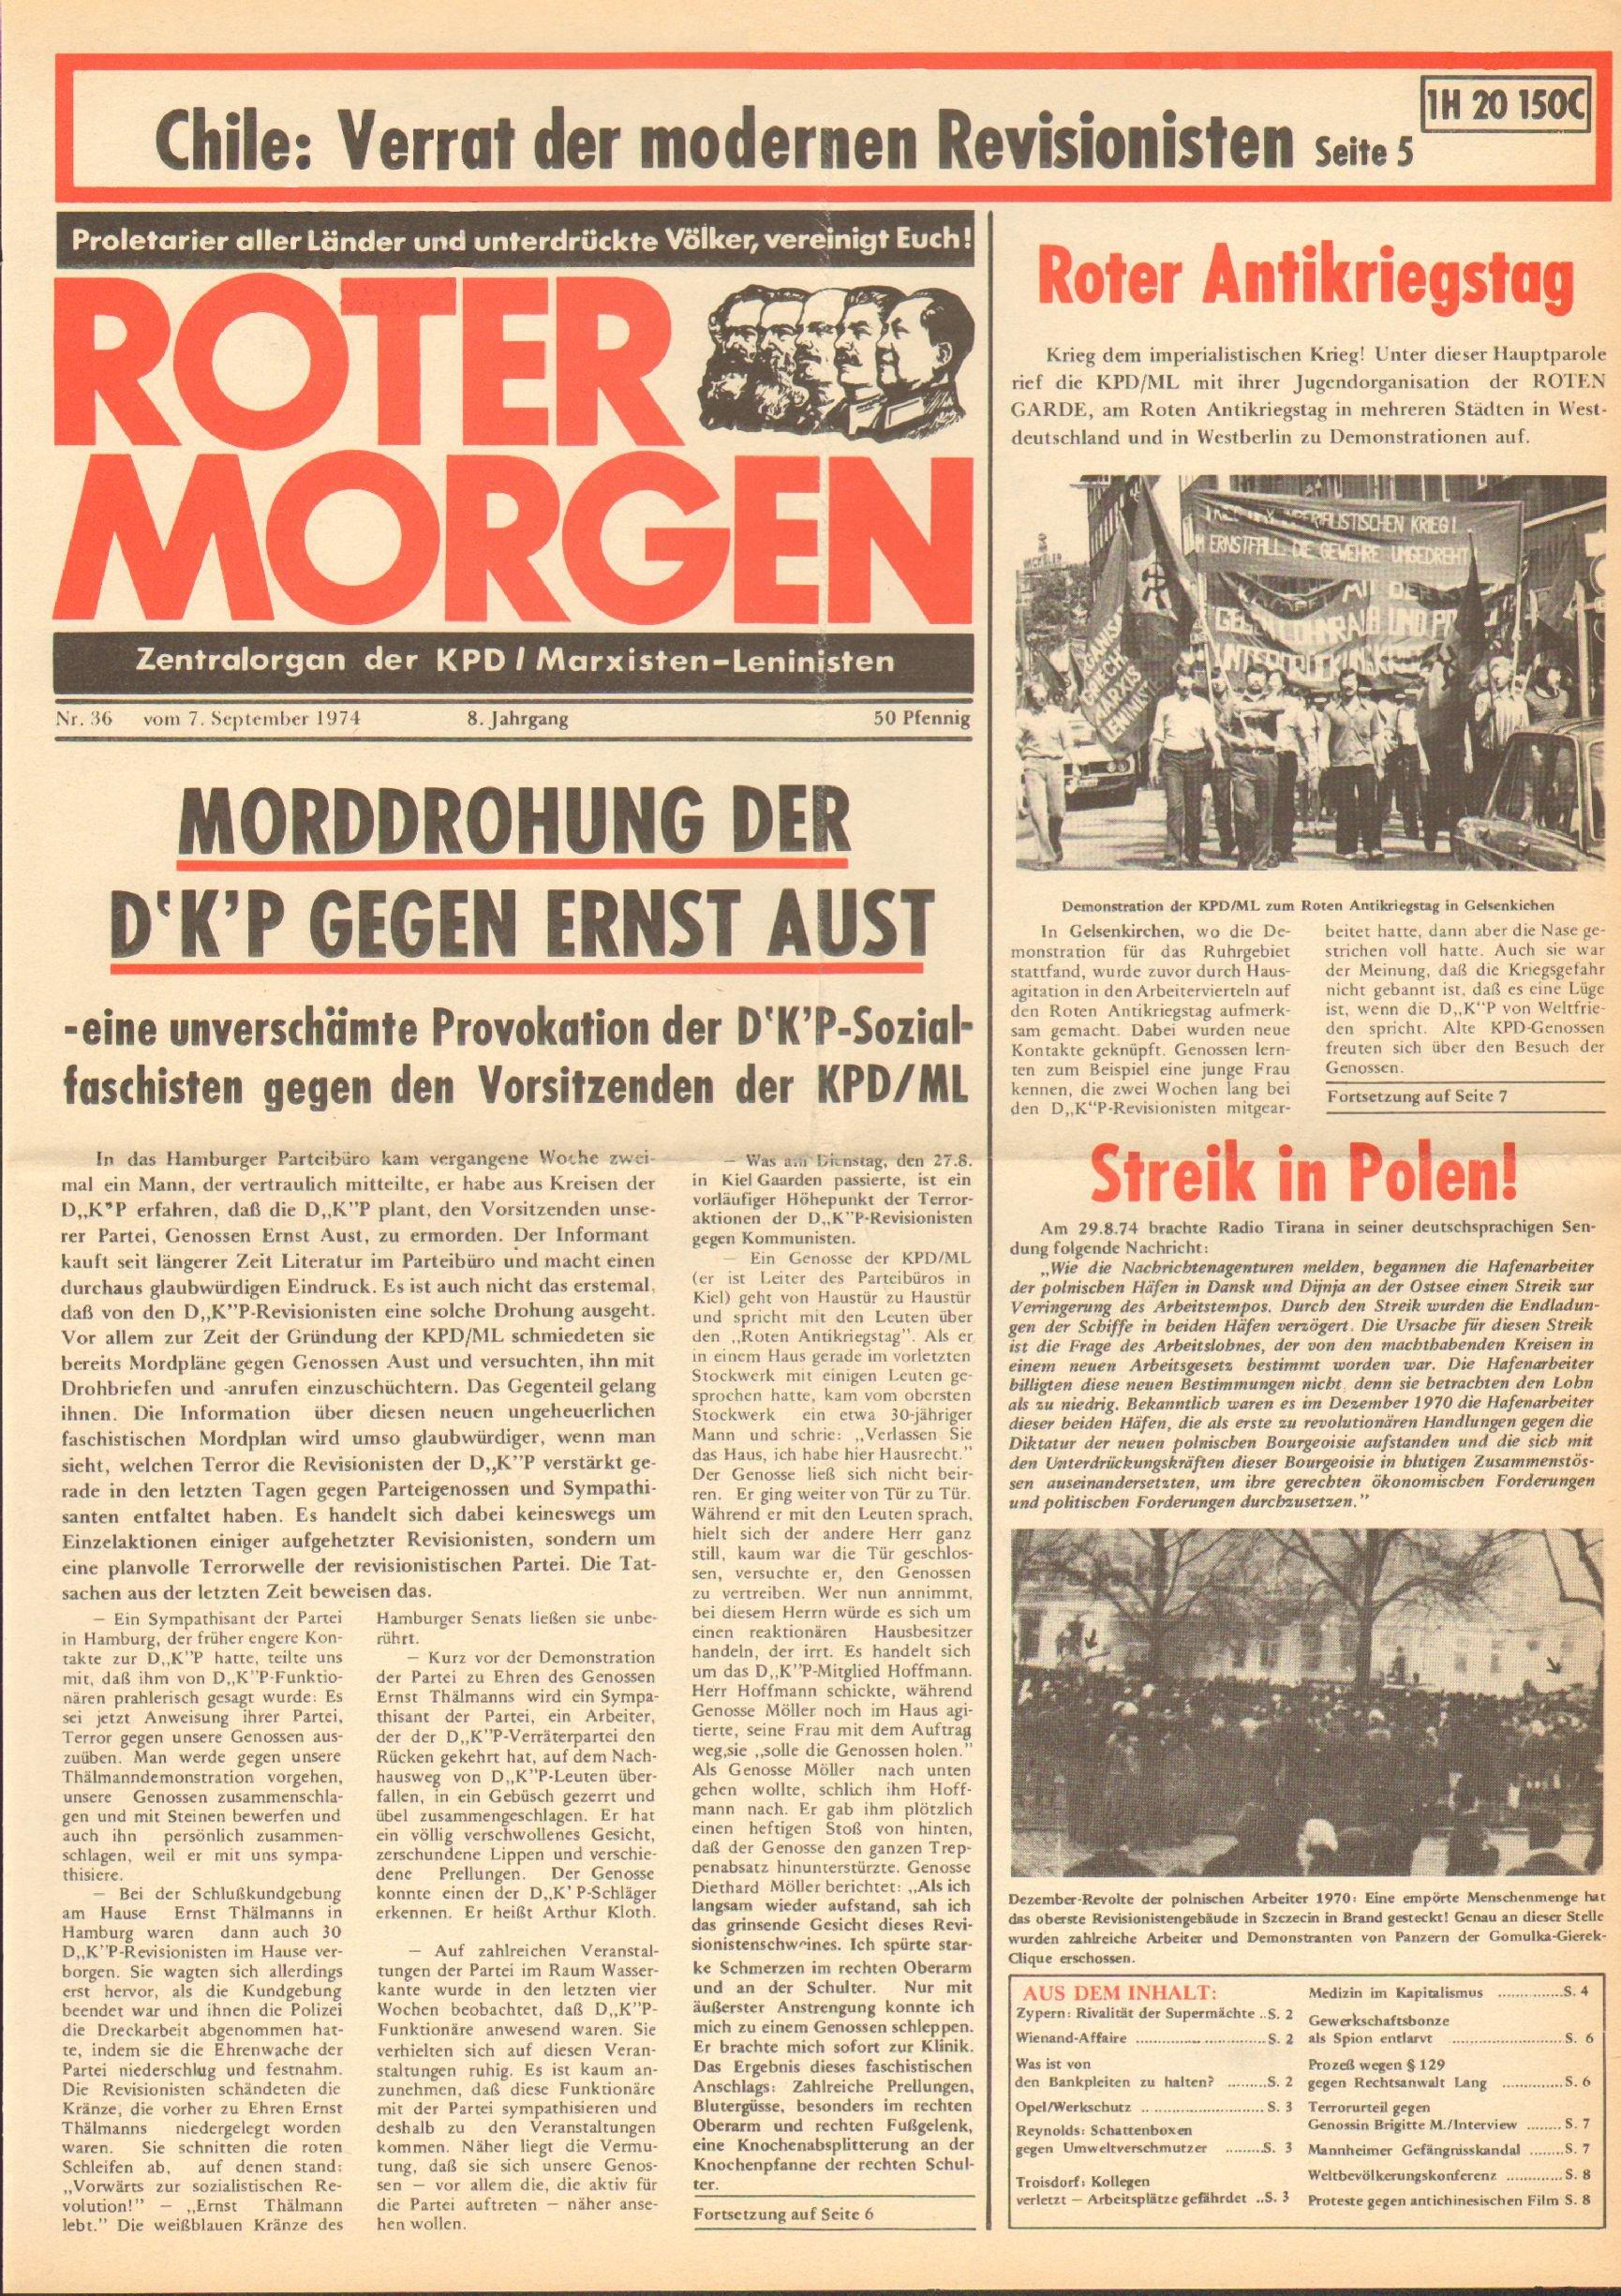 Roter Morgen, 8. Jg., 7. September 1974, Nr. 36, Seite 1